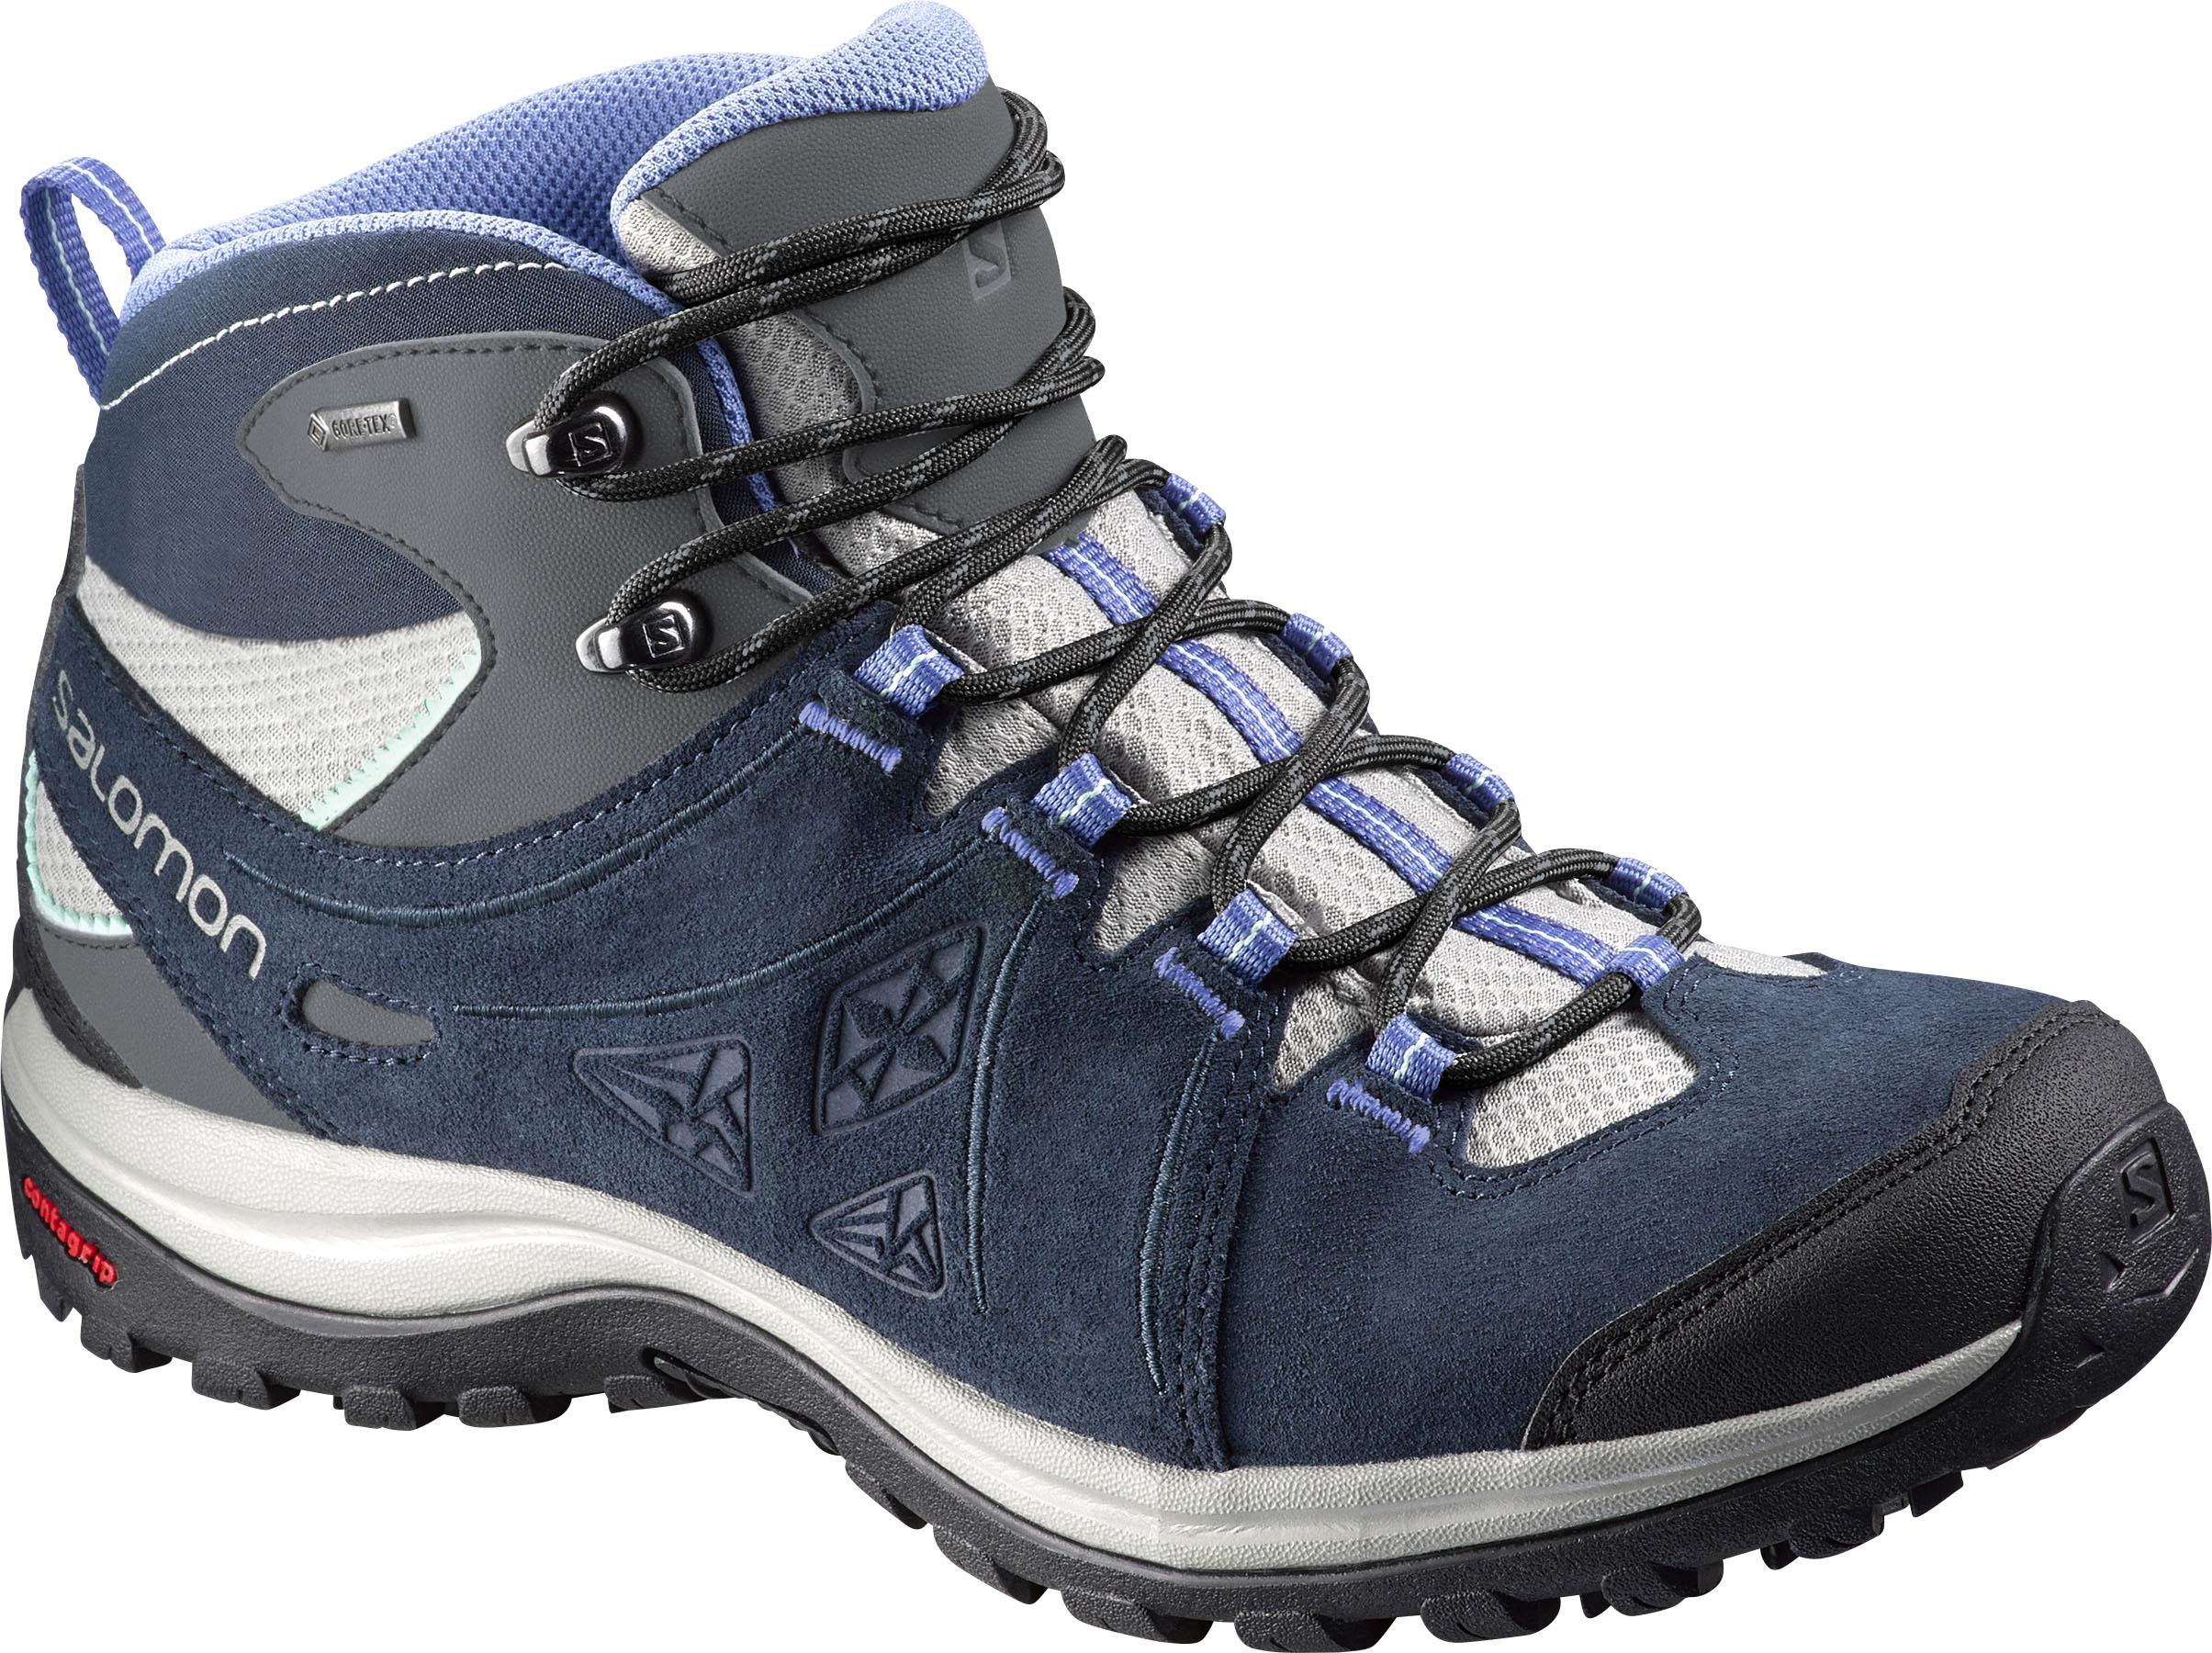 size 40 b43d9 370c4 Salomon Ellipse 2 LTR Gore-Tex Womens Mid Walking Boots in Blue